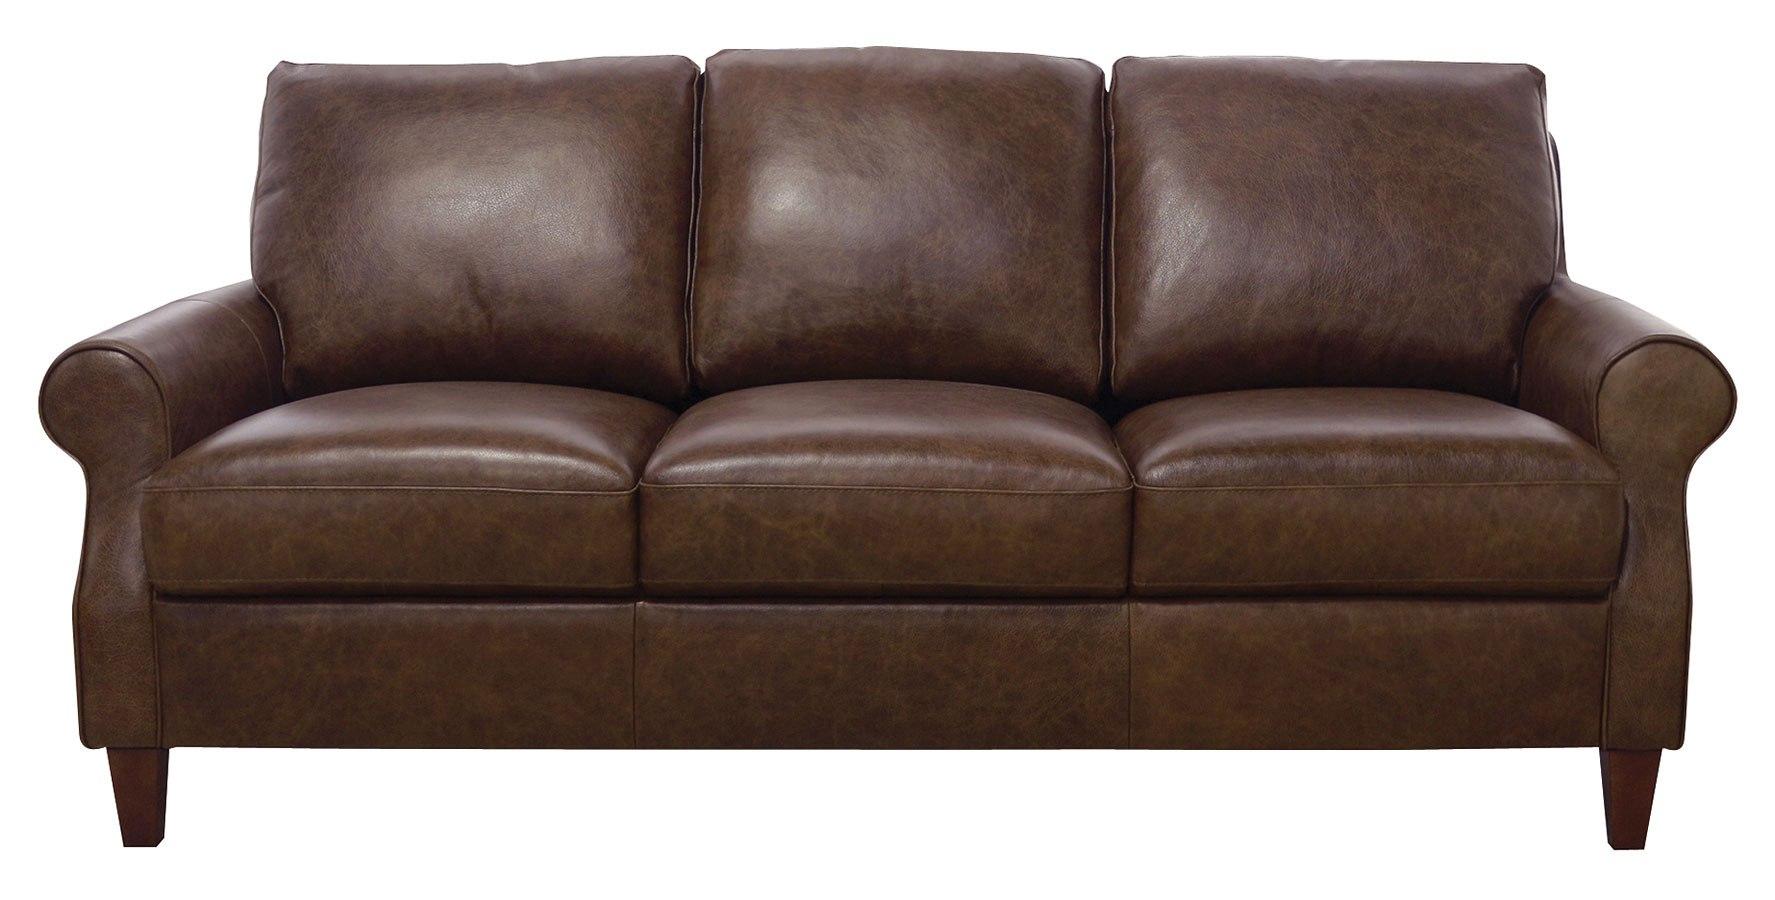 Rachel Italian Leather Sofa